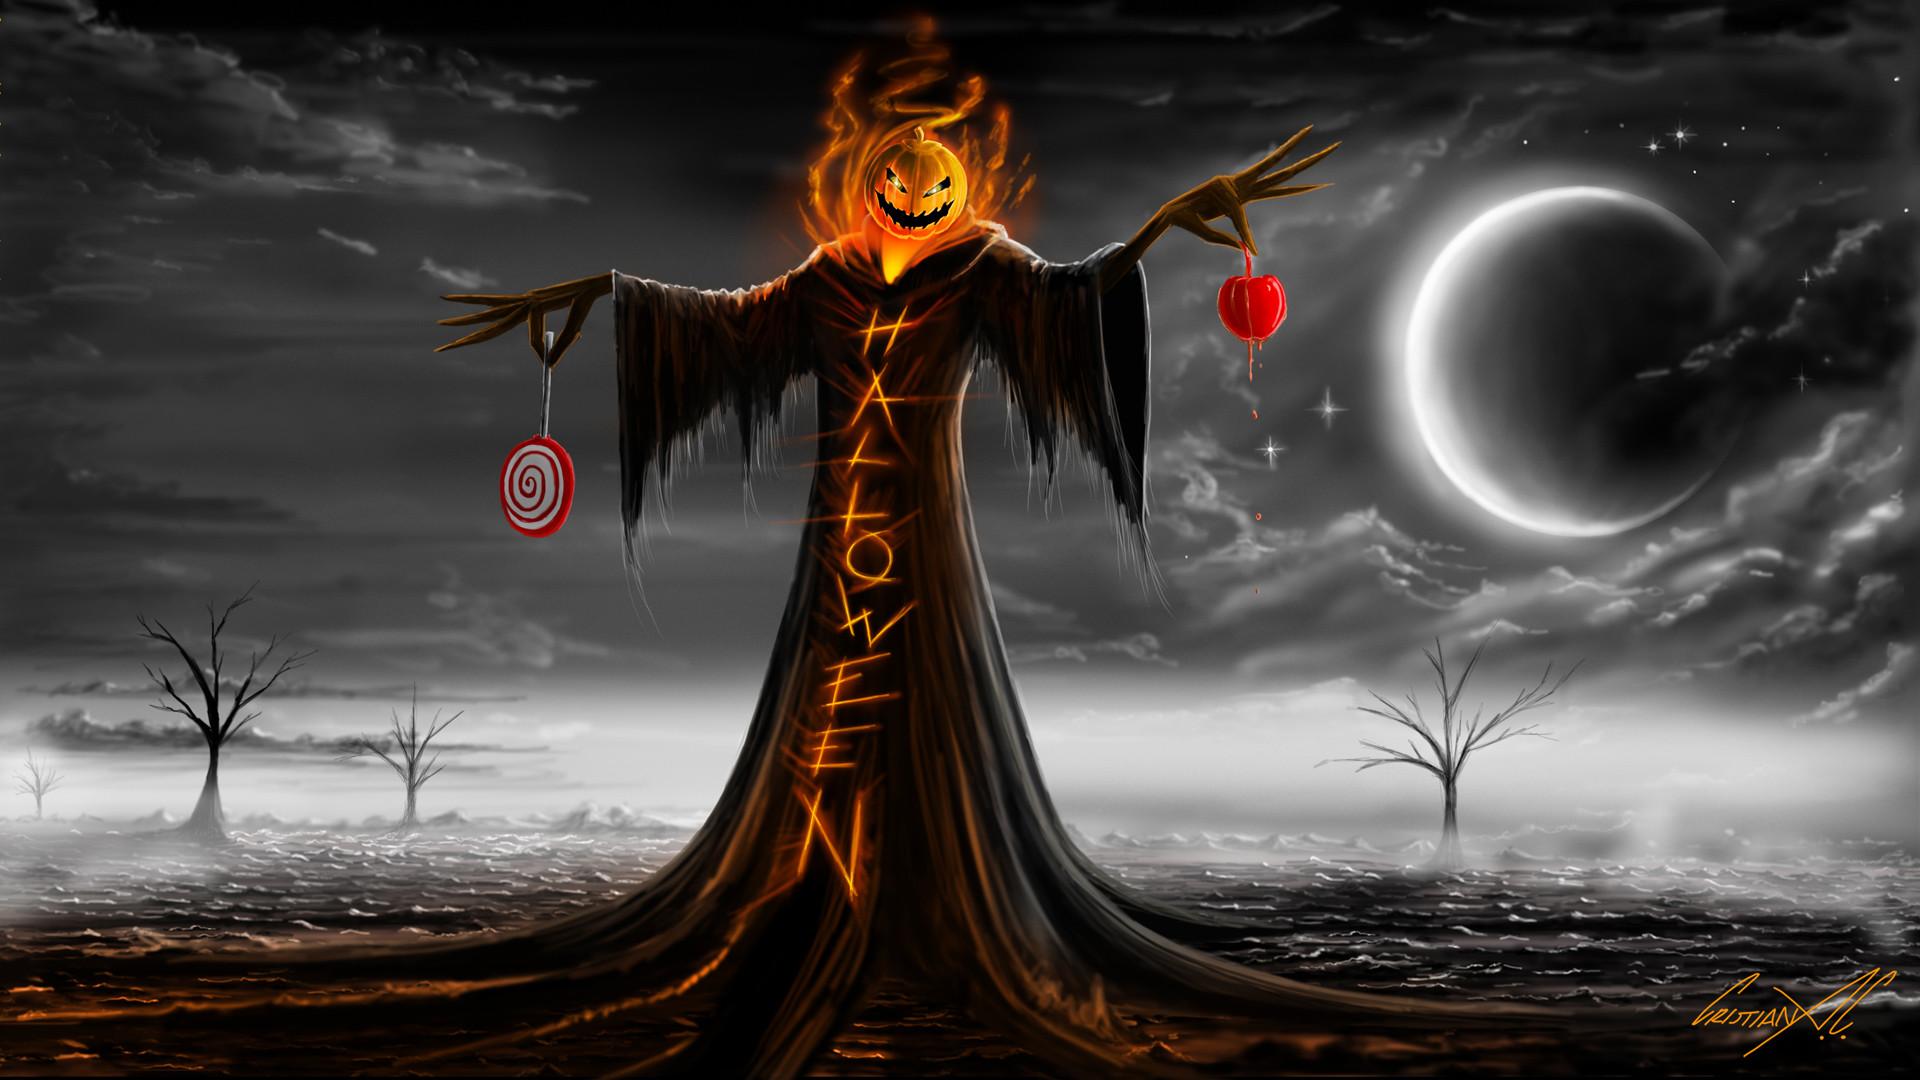 Halloween Wallpaper | Halloween wallpaper 2012, full hd 1080p